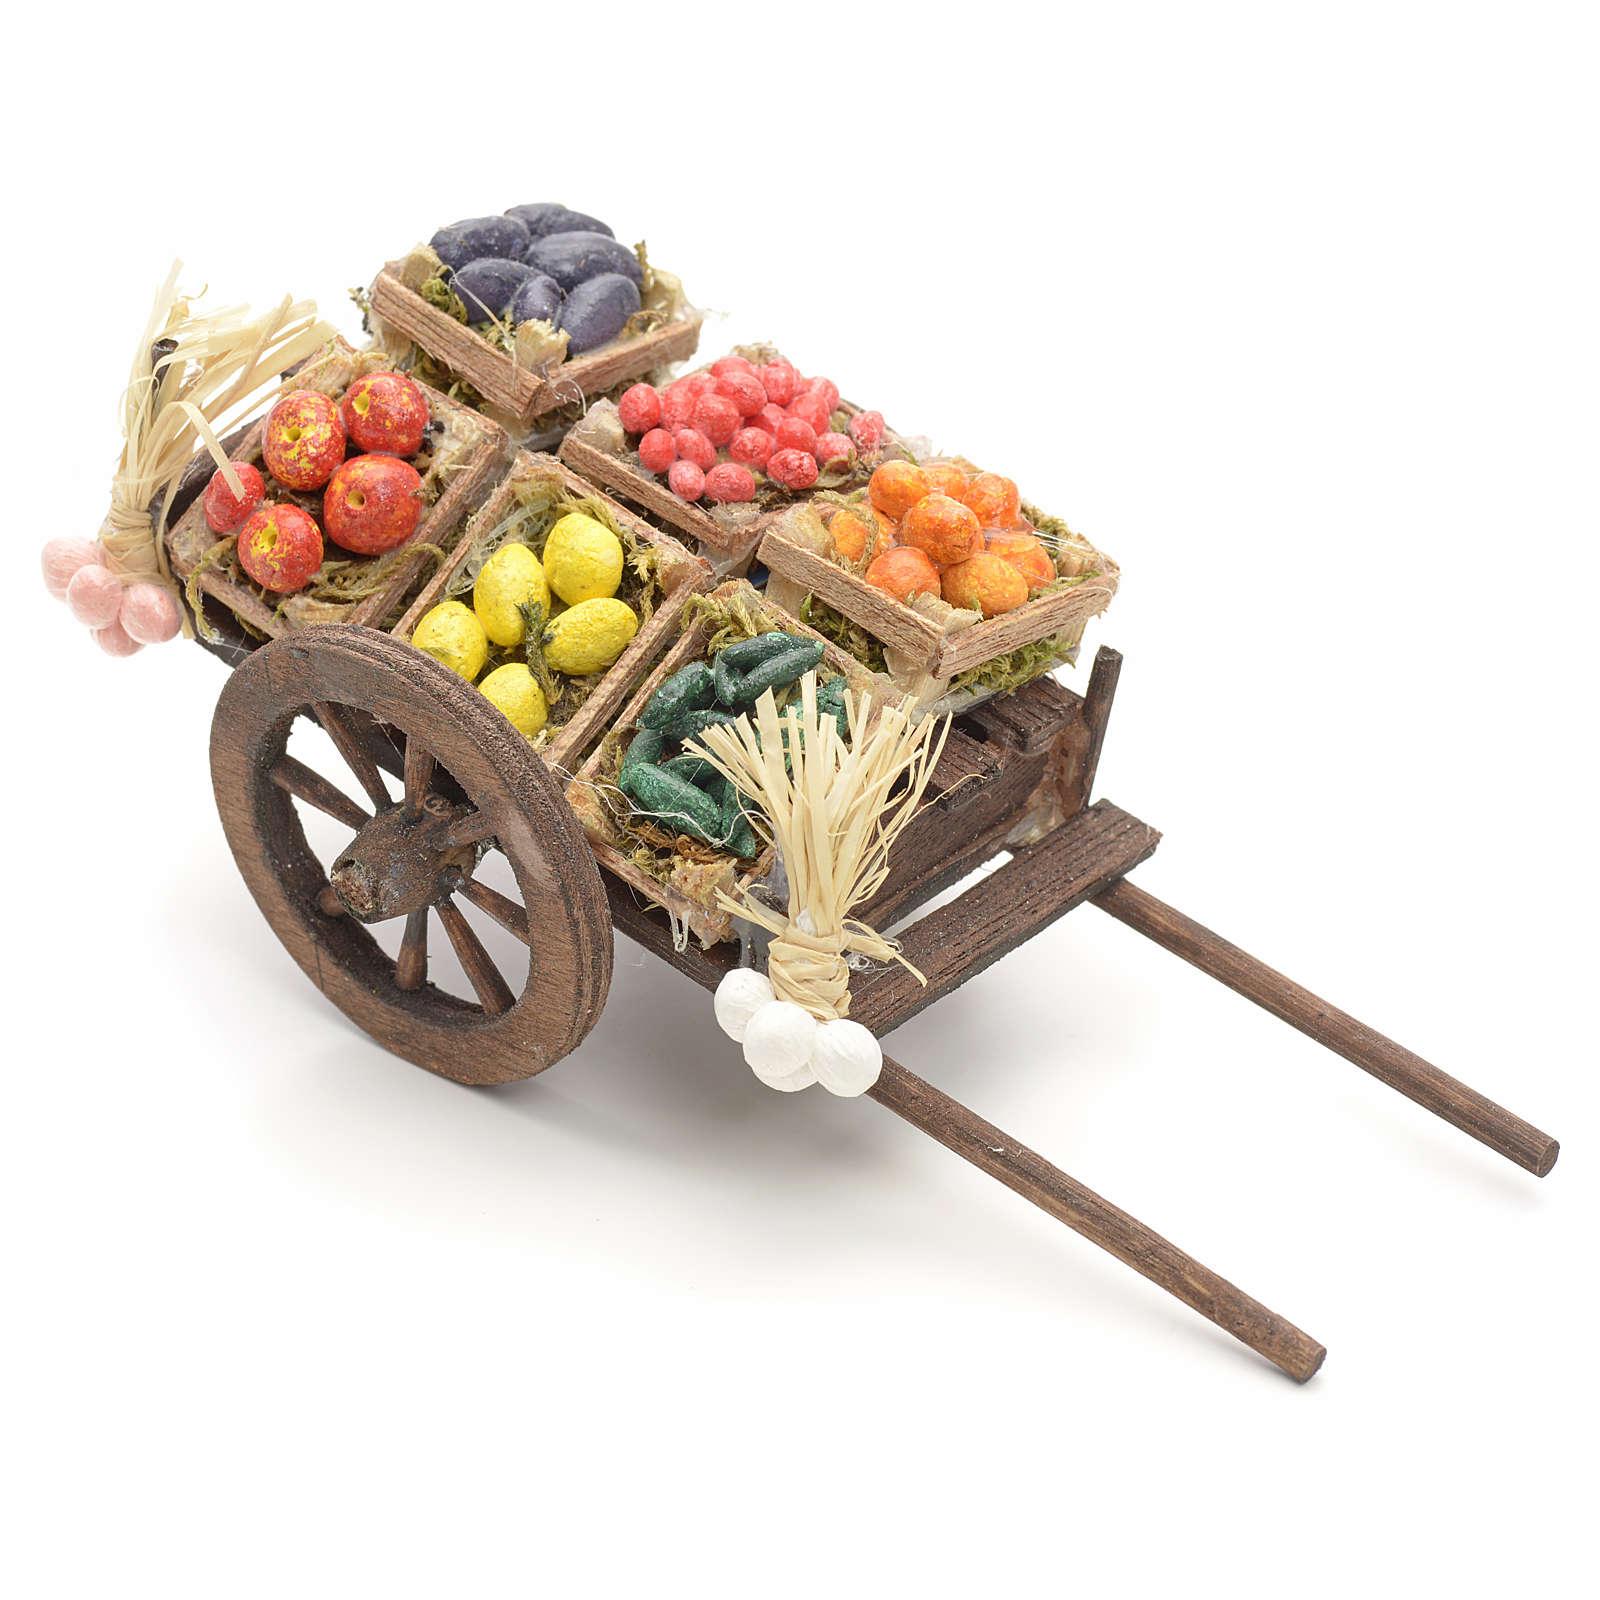 Neapolitan nativity accessory, fruit cart 8cm 4